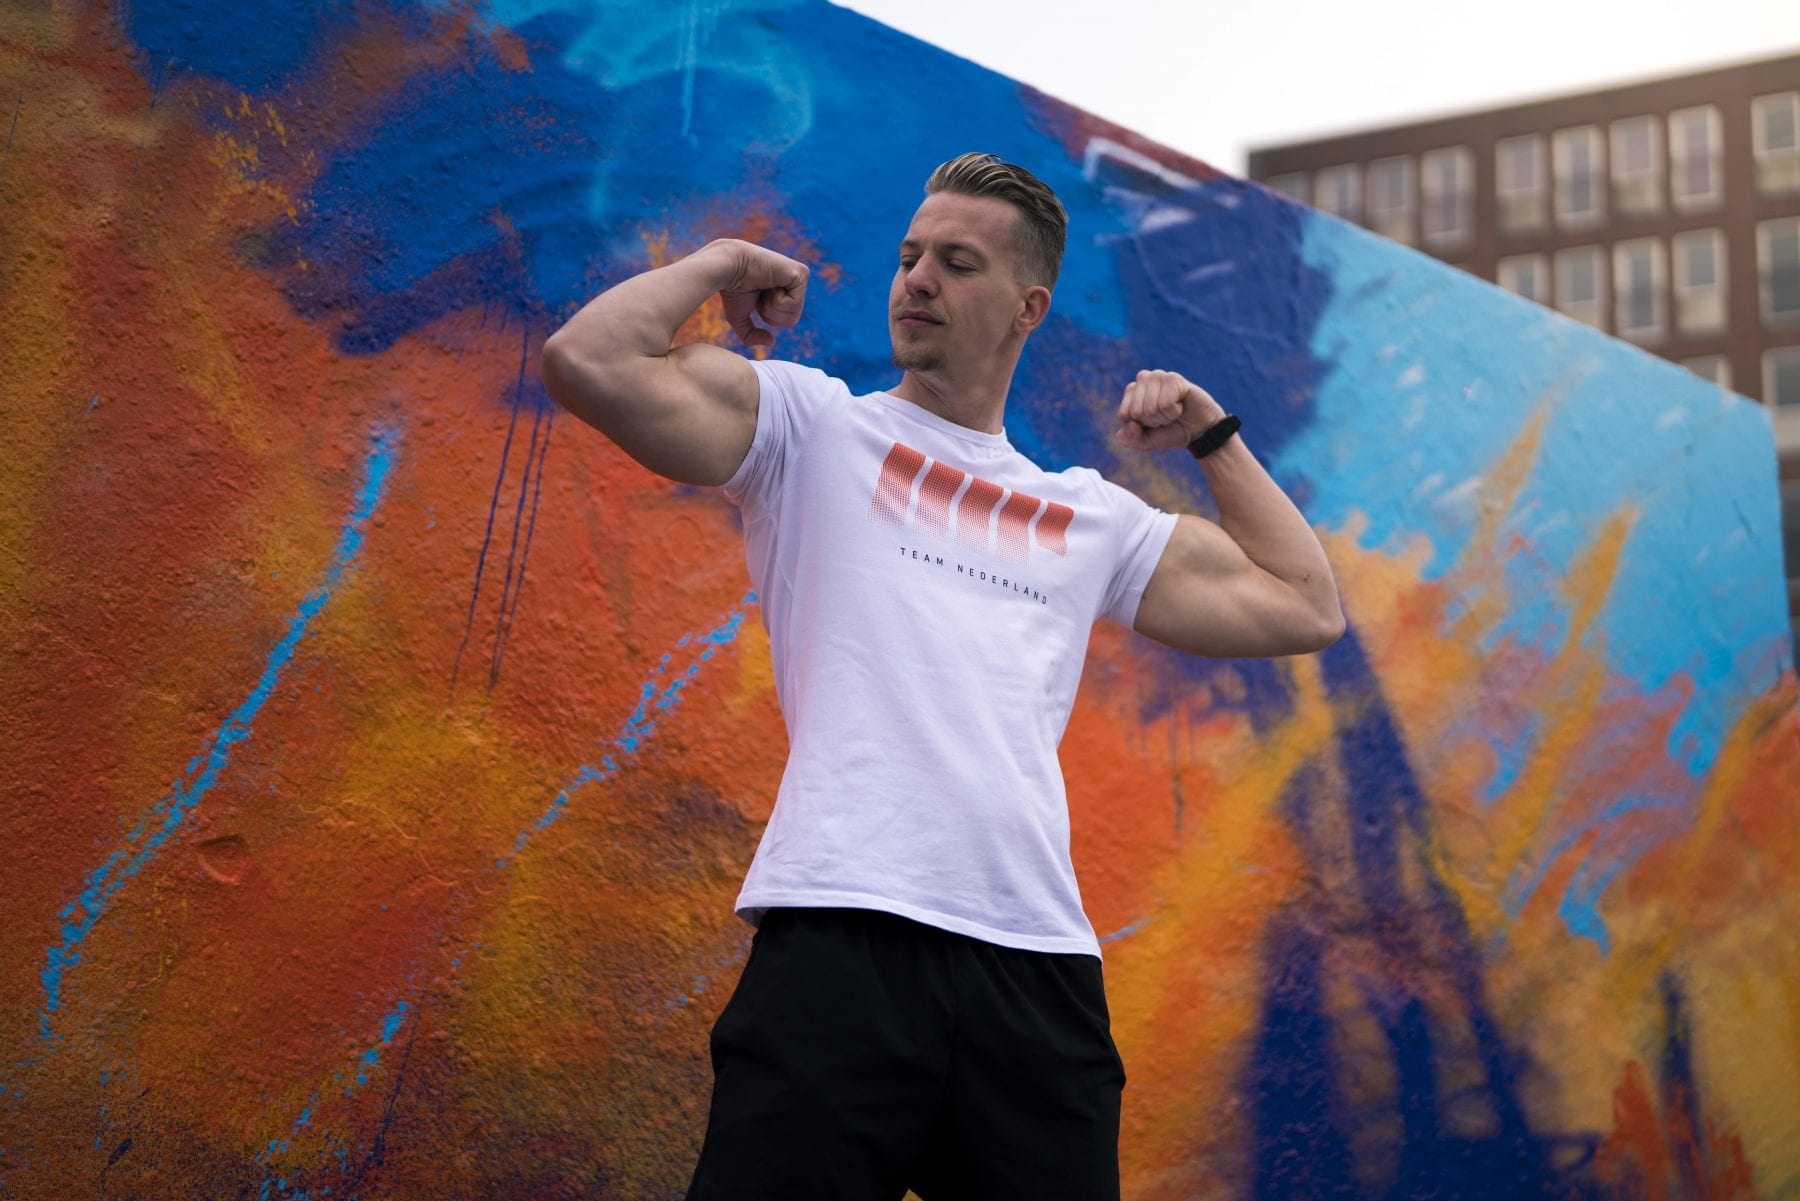 Kingday T-shirt Nederland Shirt Team Nederland Myprotein Oranje Boven Anthony Kruijver